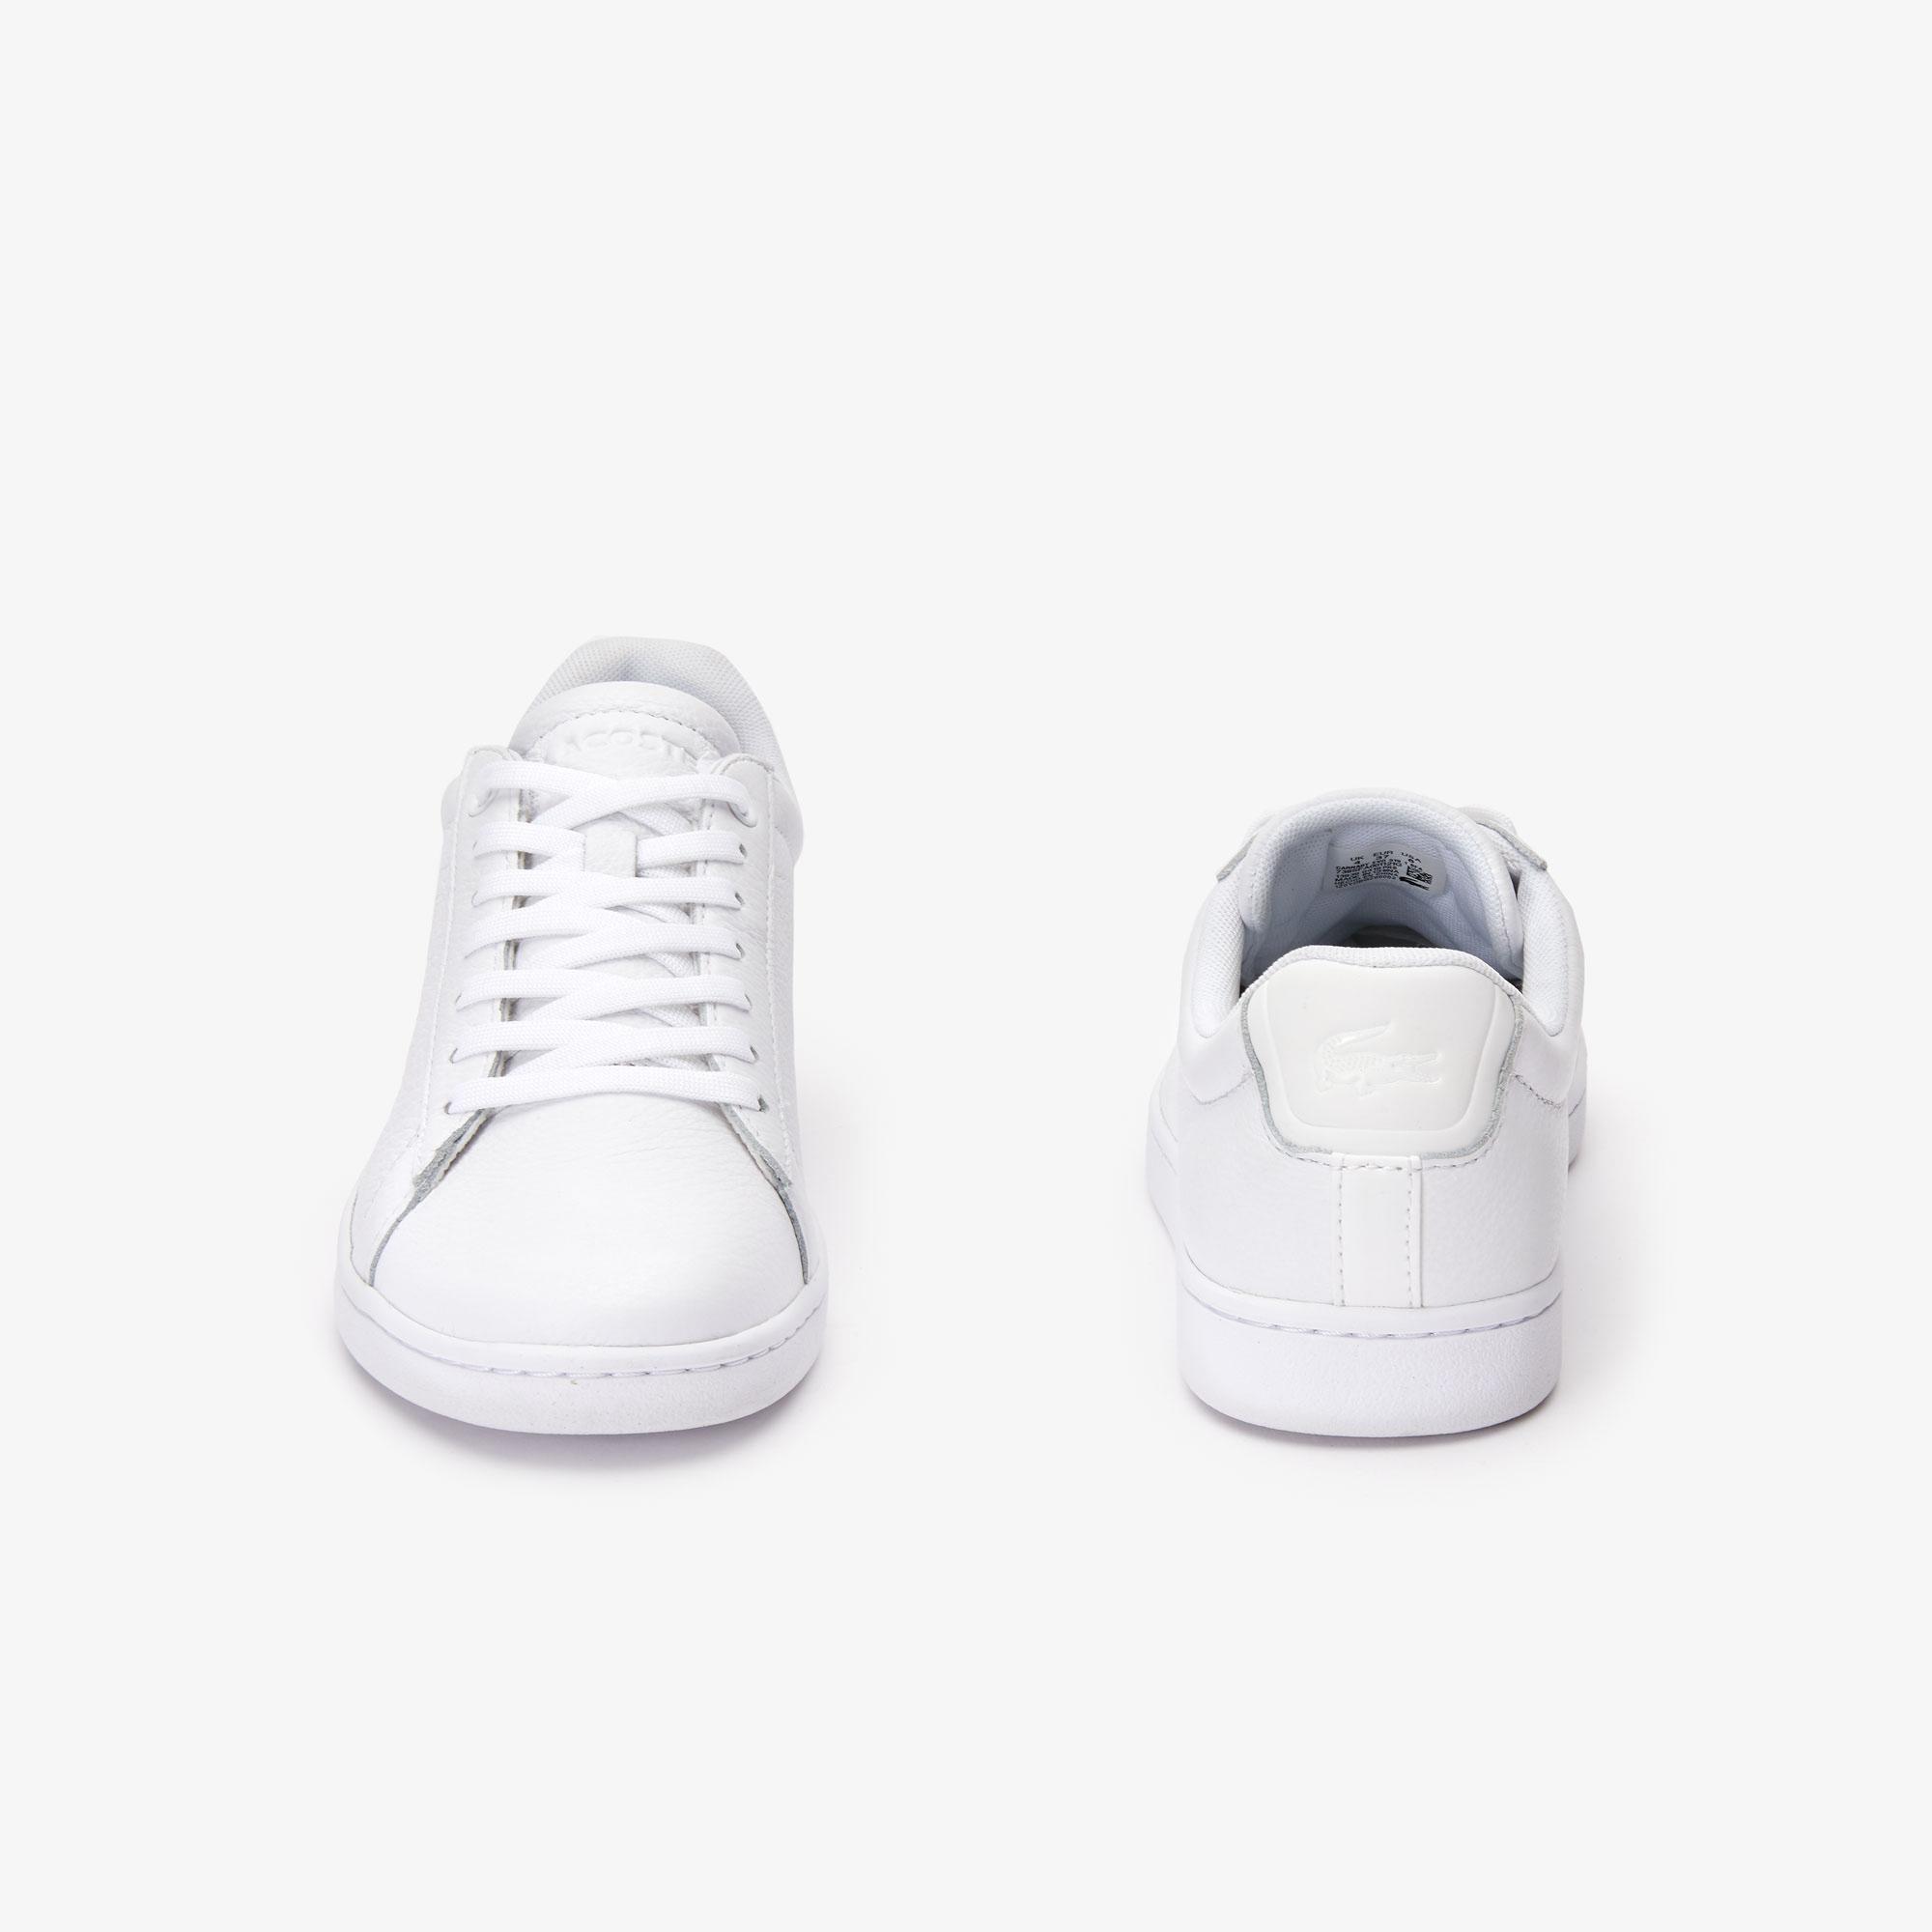 Lacoste Carnaby Evo 319 1 Damskie Sneakersy